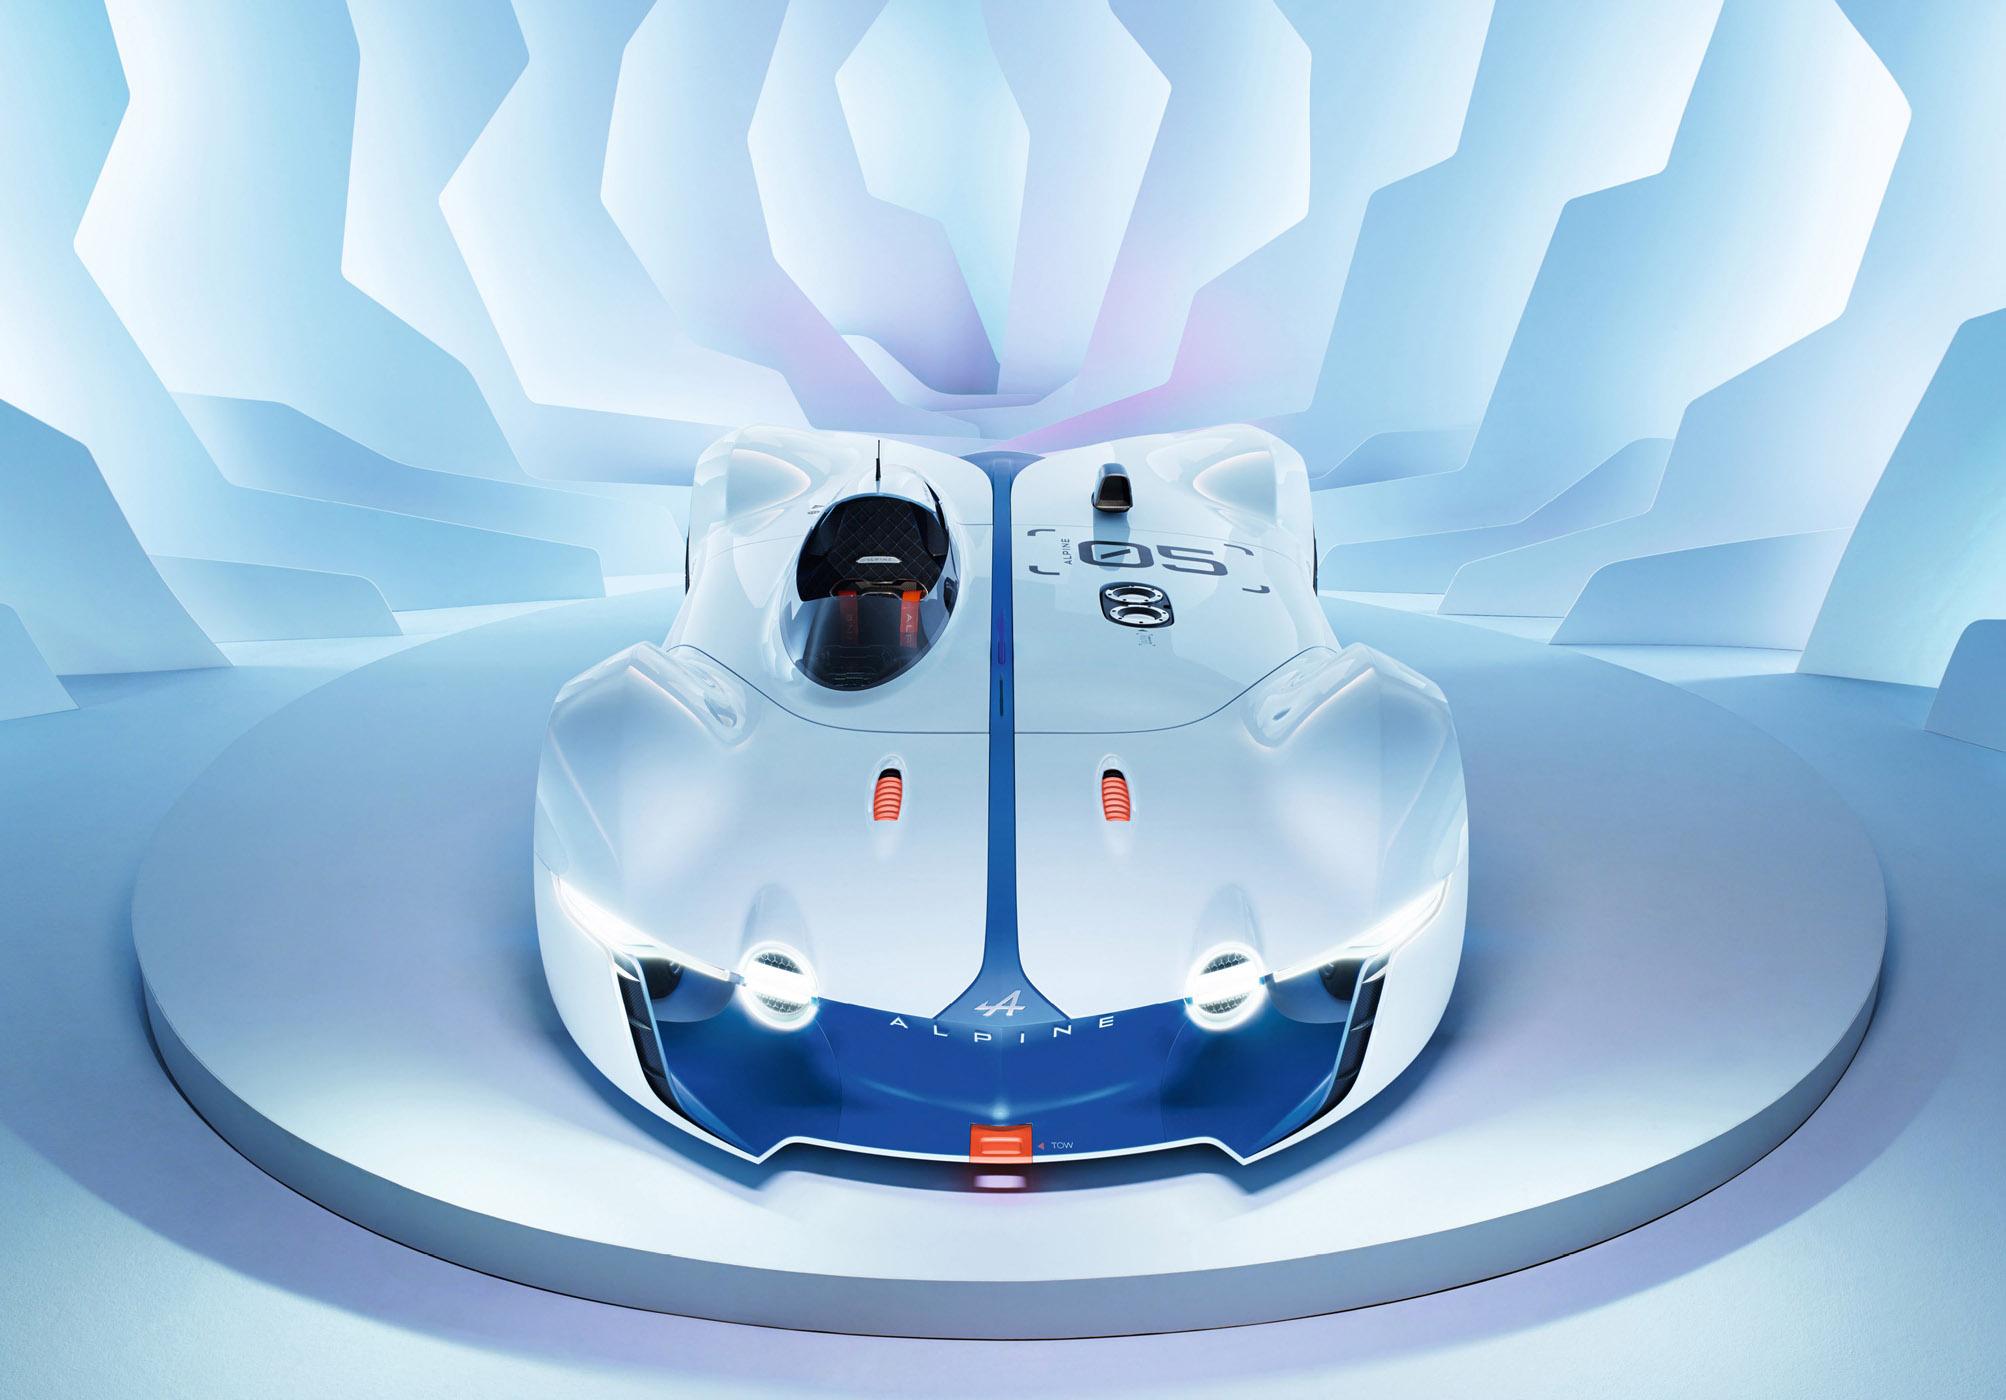 2015 Alpine Vision Gran Turismo